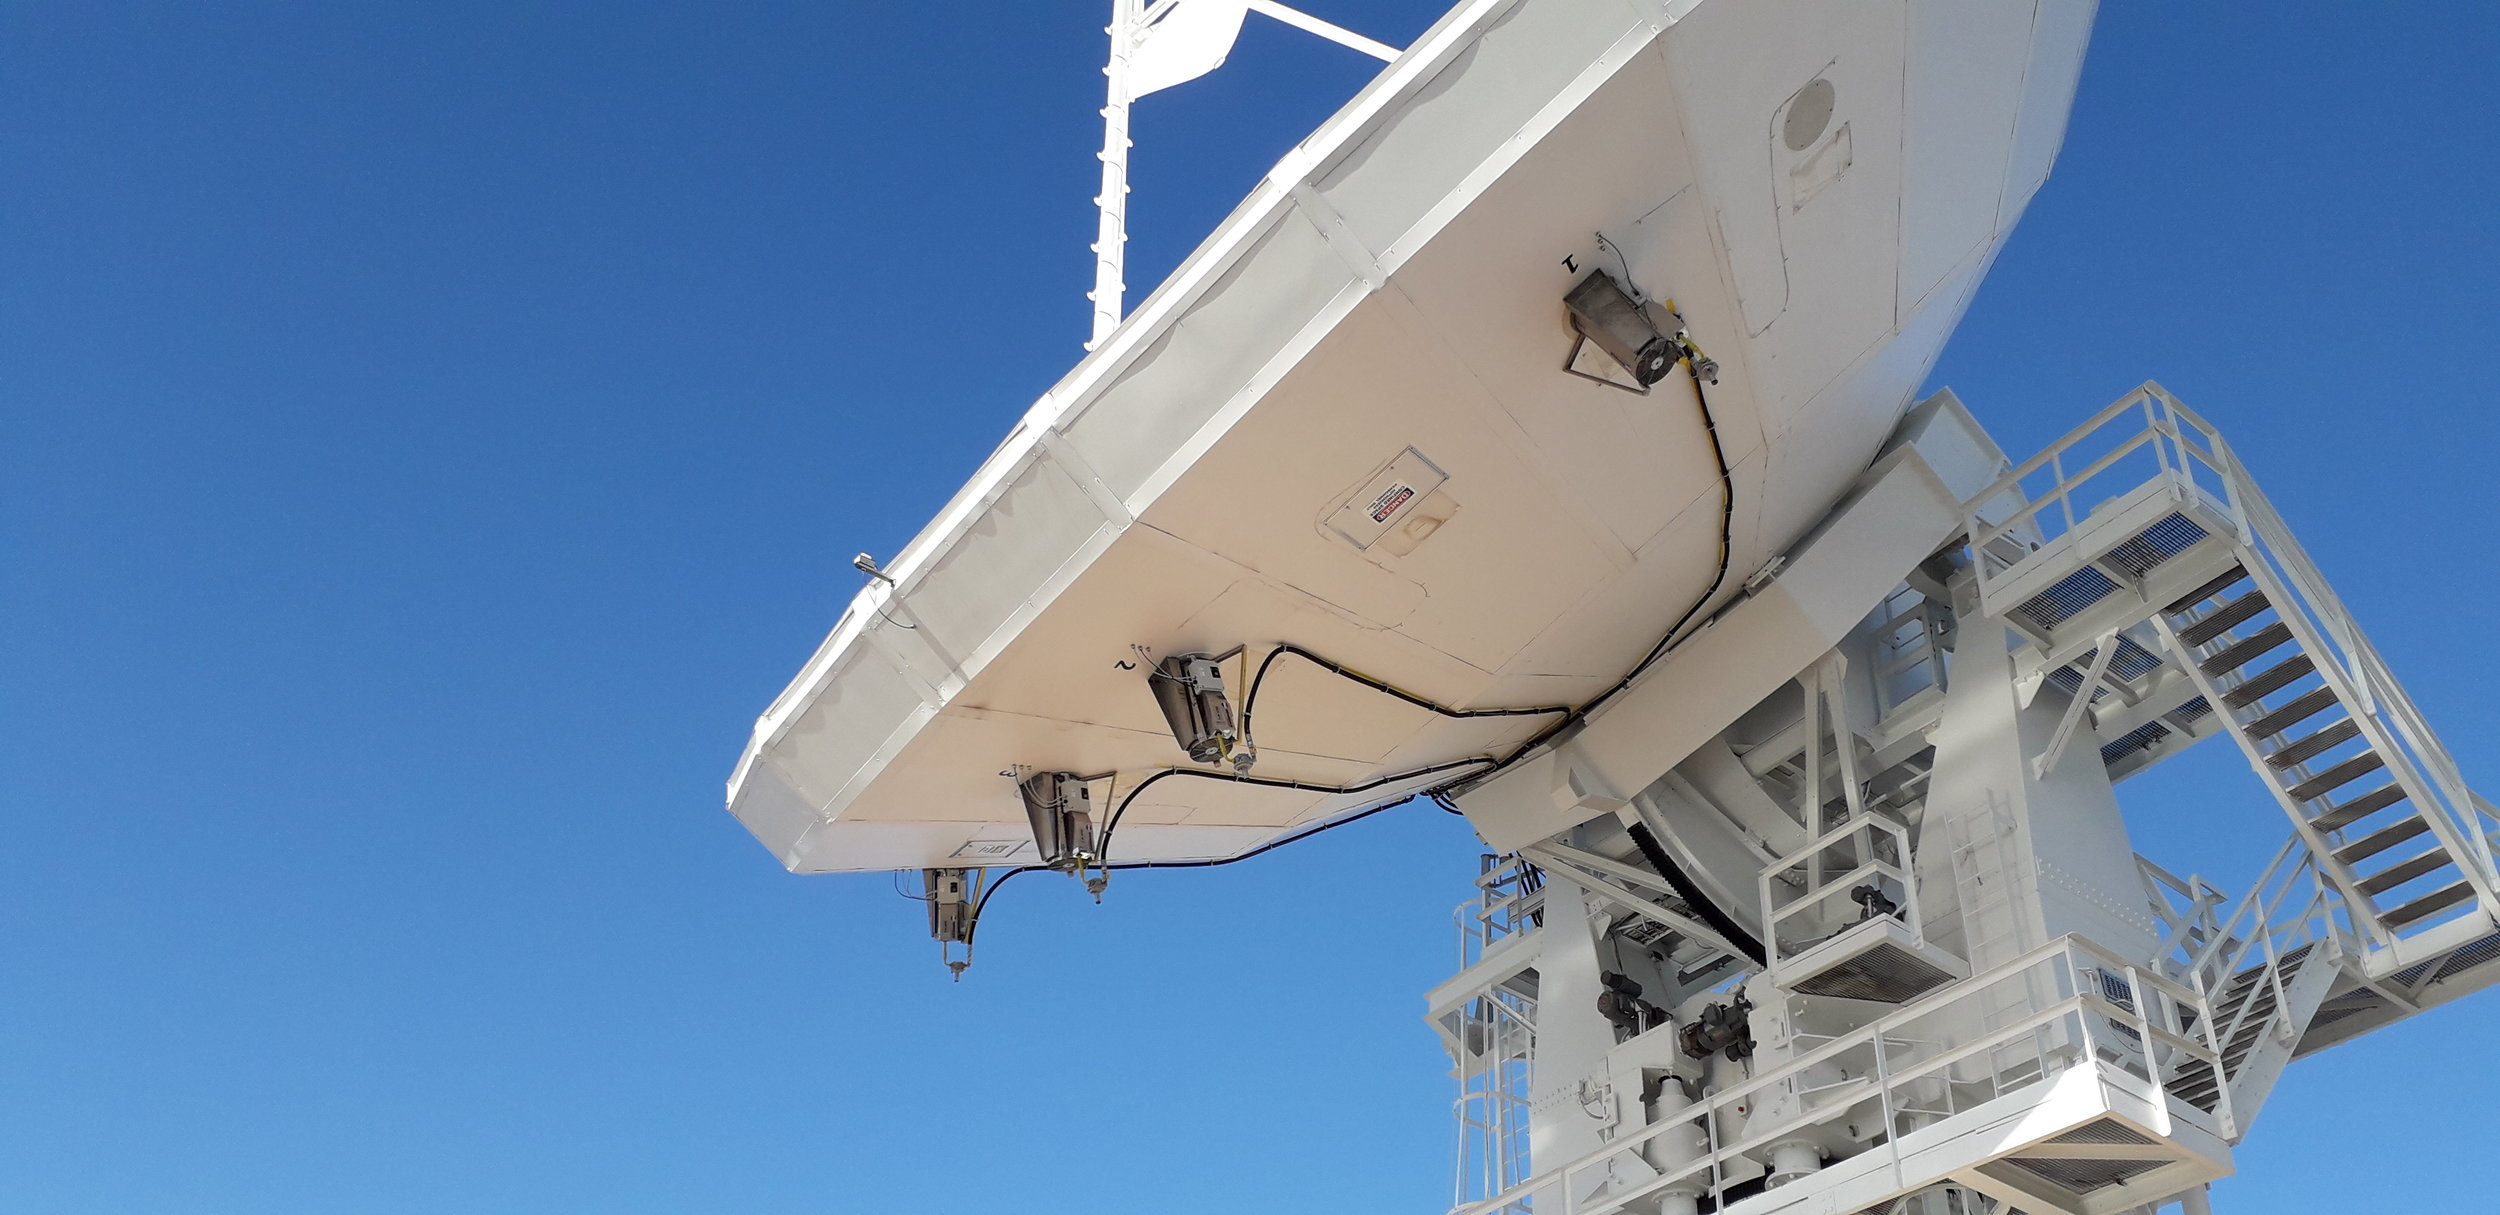 Biemmedue riscaldamento professionale generatori d'aria calda made in italy20190115_112629.jpg